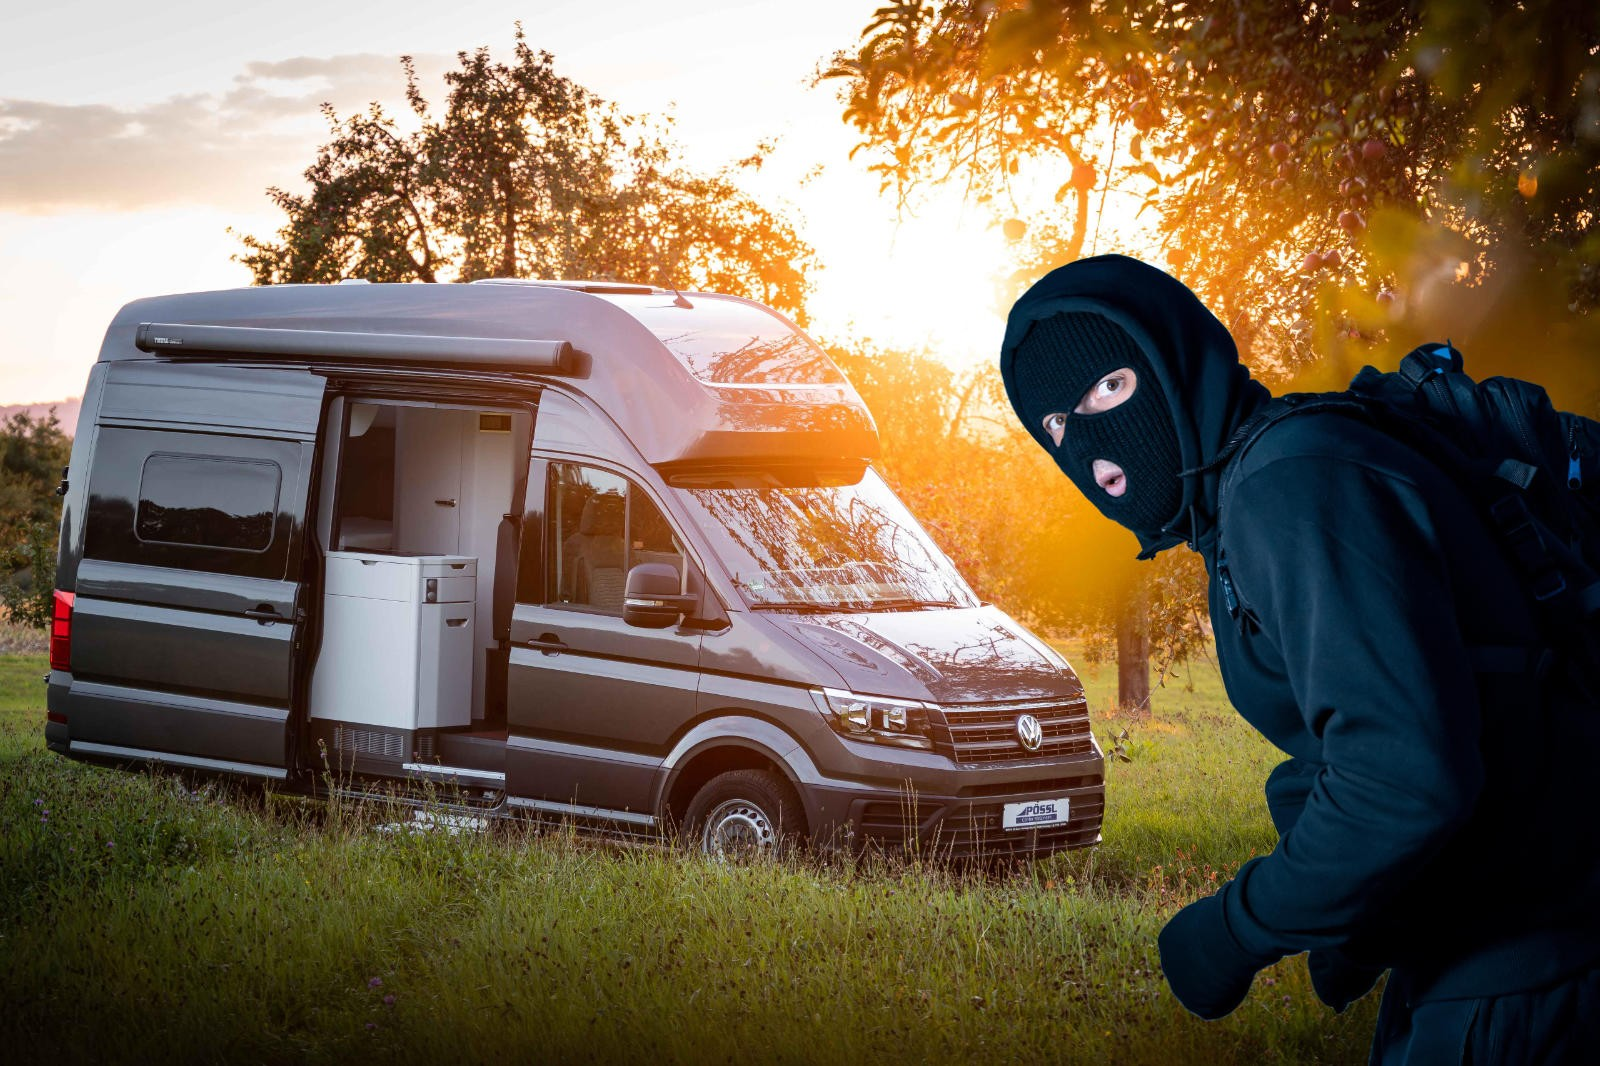 Wohnmobil Versicherung Ratgeber - kein teurer Ärger im Schadensfall